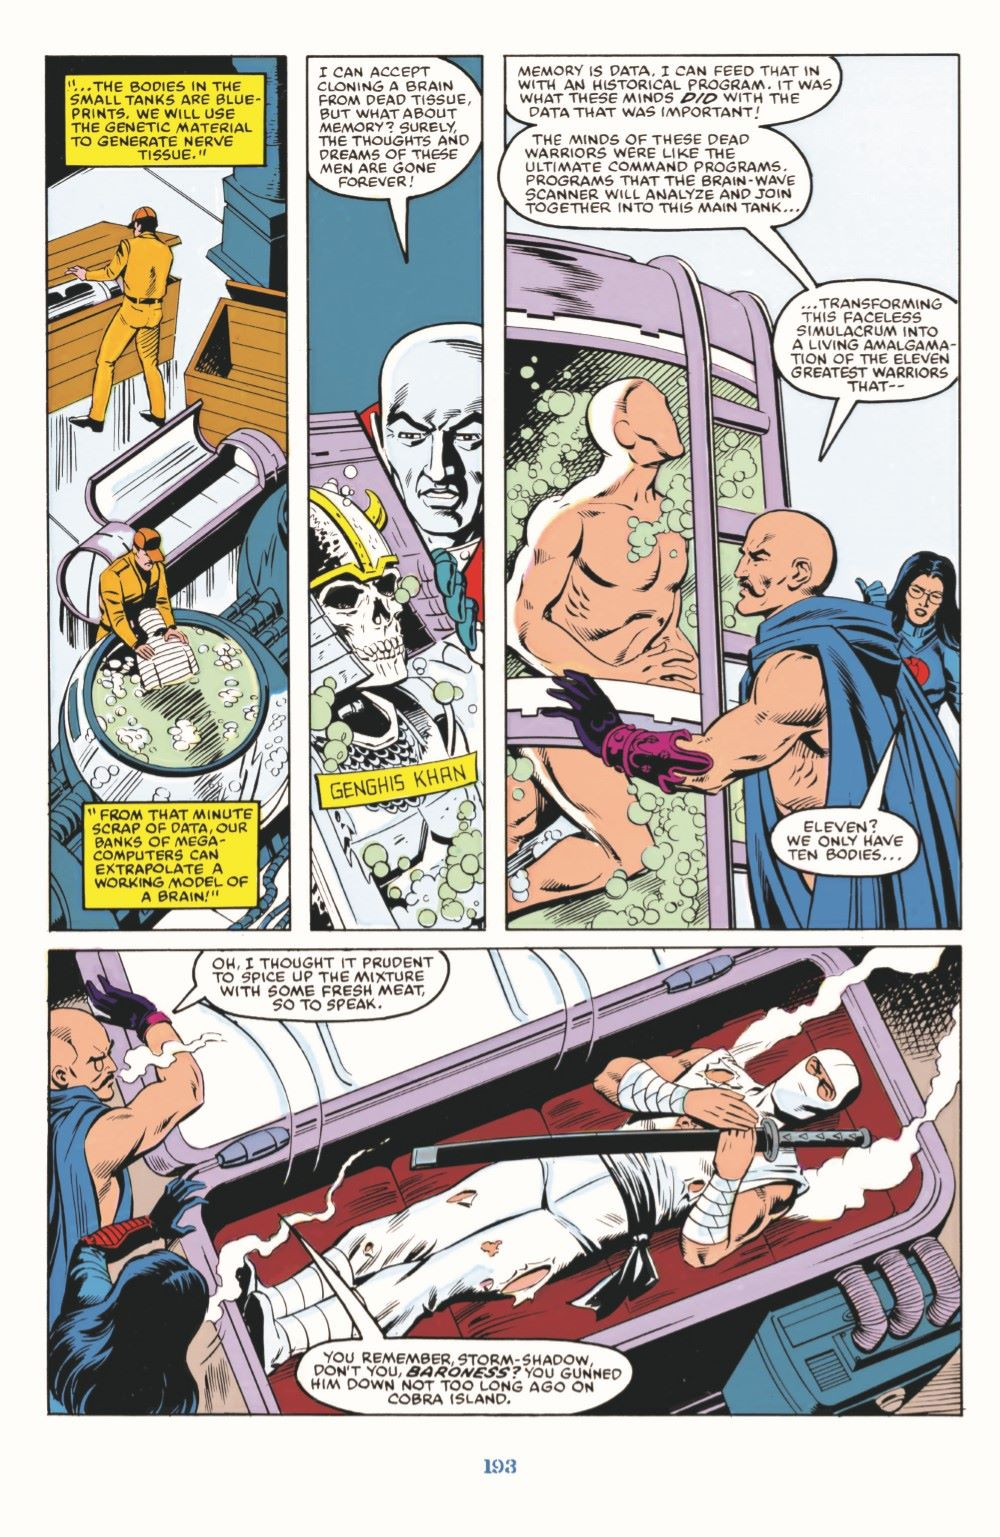 GIJoeRAH_SerpentorUncoiled-pr-08 ComicList Previews: G.I. JOE A REAL AMERICAN HERO SERPENTOR UNCOILED #1